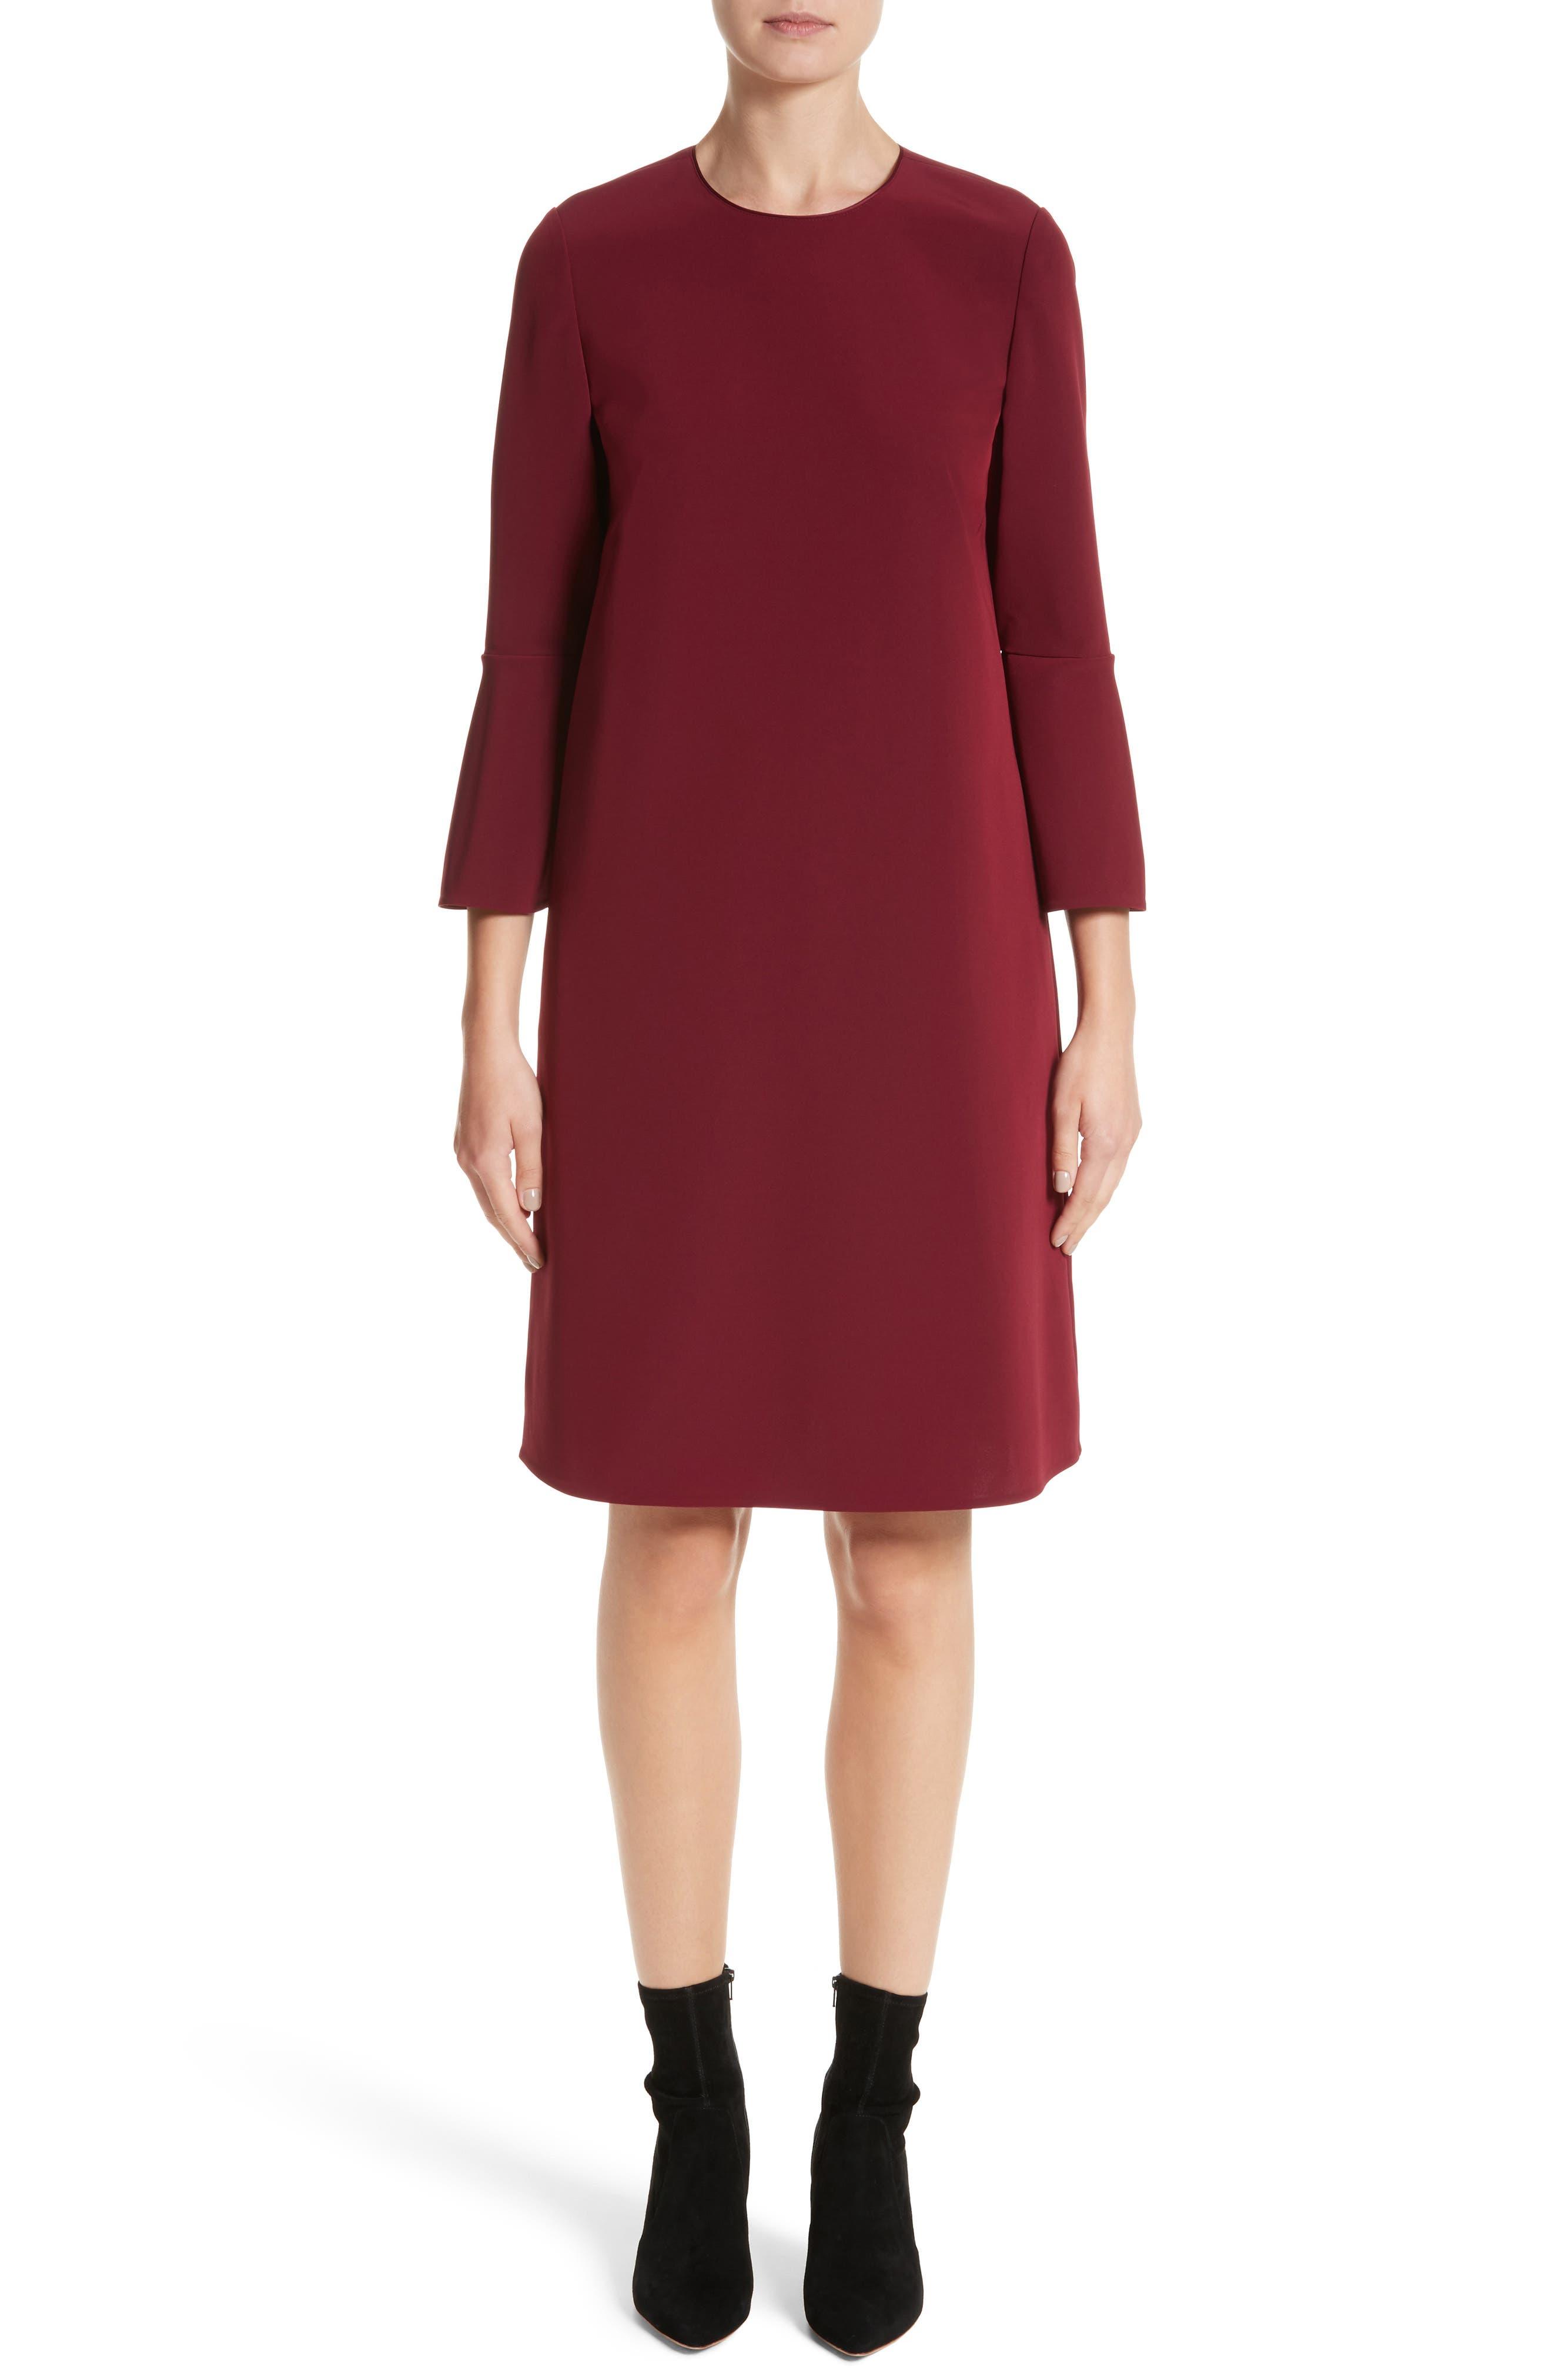 Alternate Image 1 Selected - Lafayette 148 New York Sidra Emory Cloth Dress